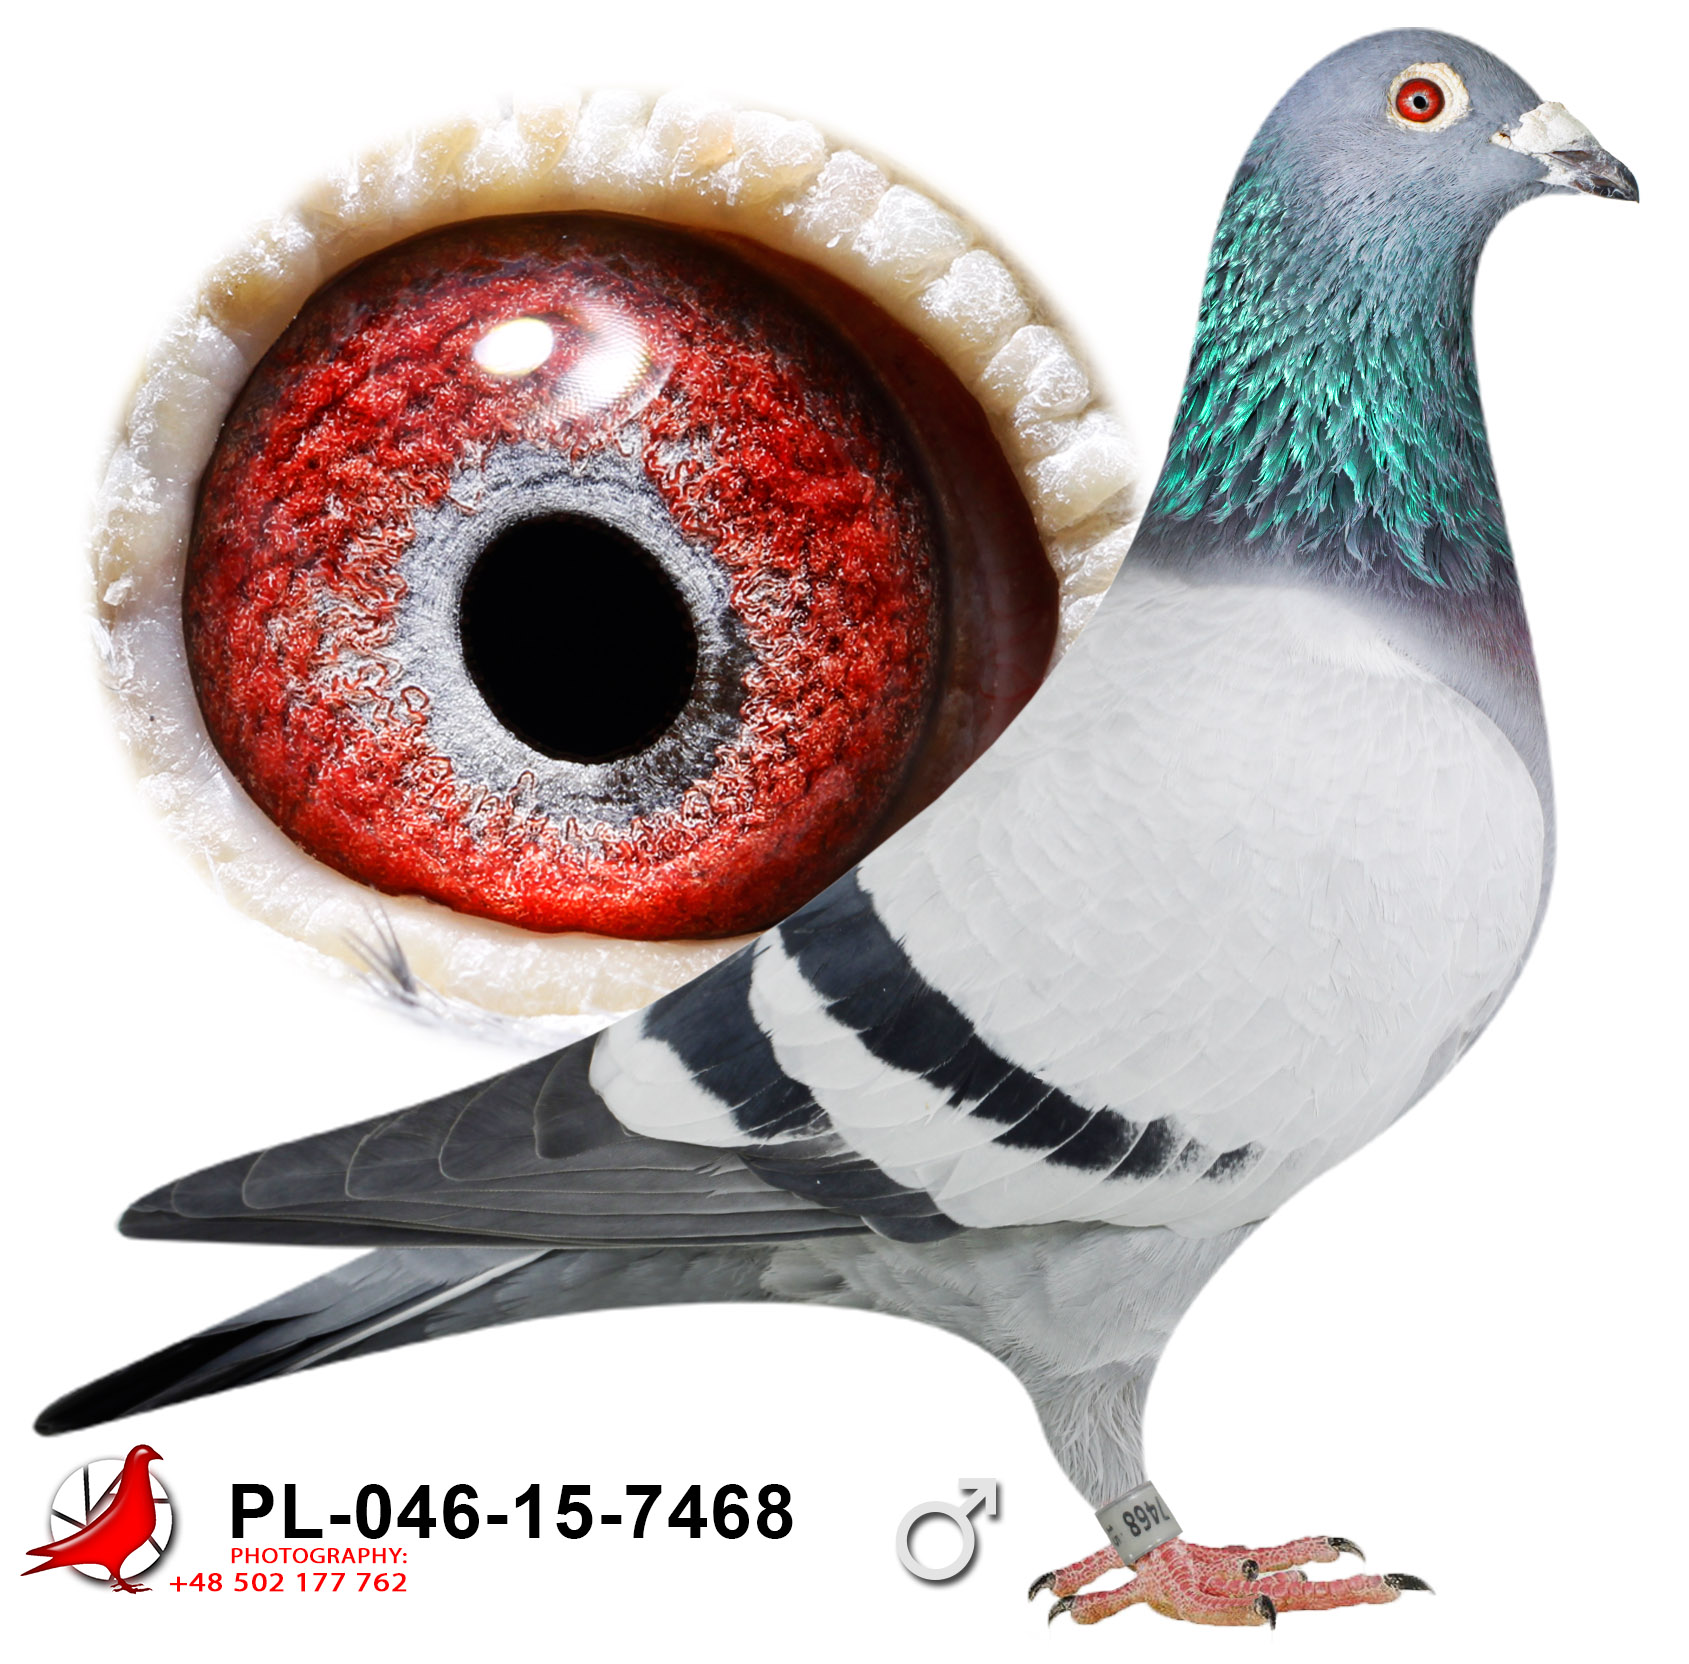 pl-046-15-7468_c (1)